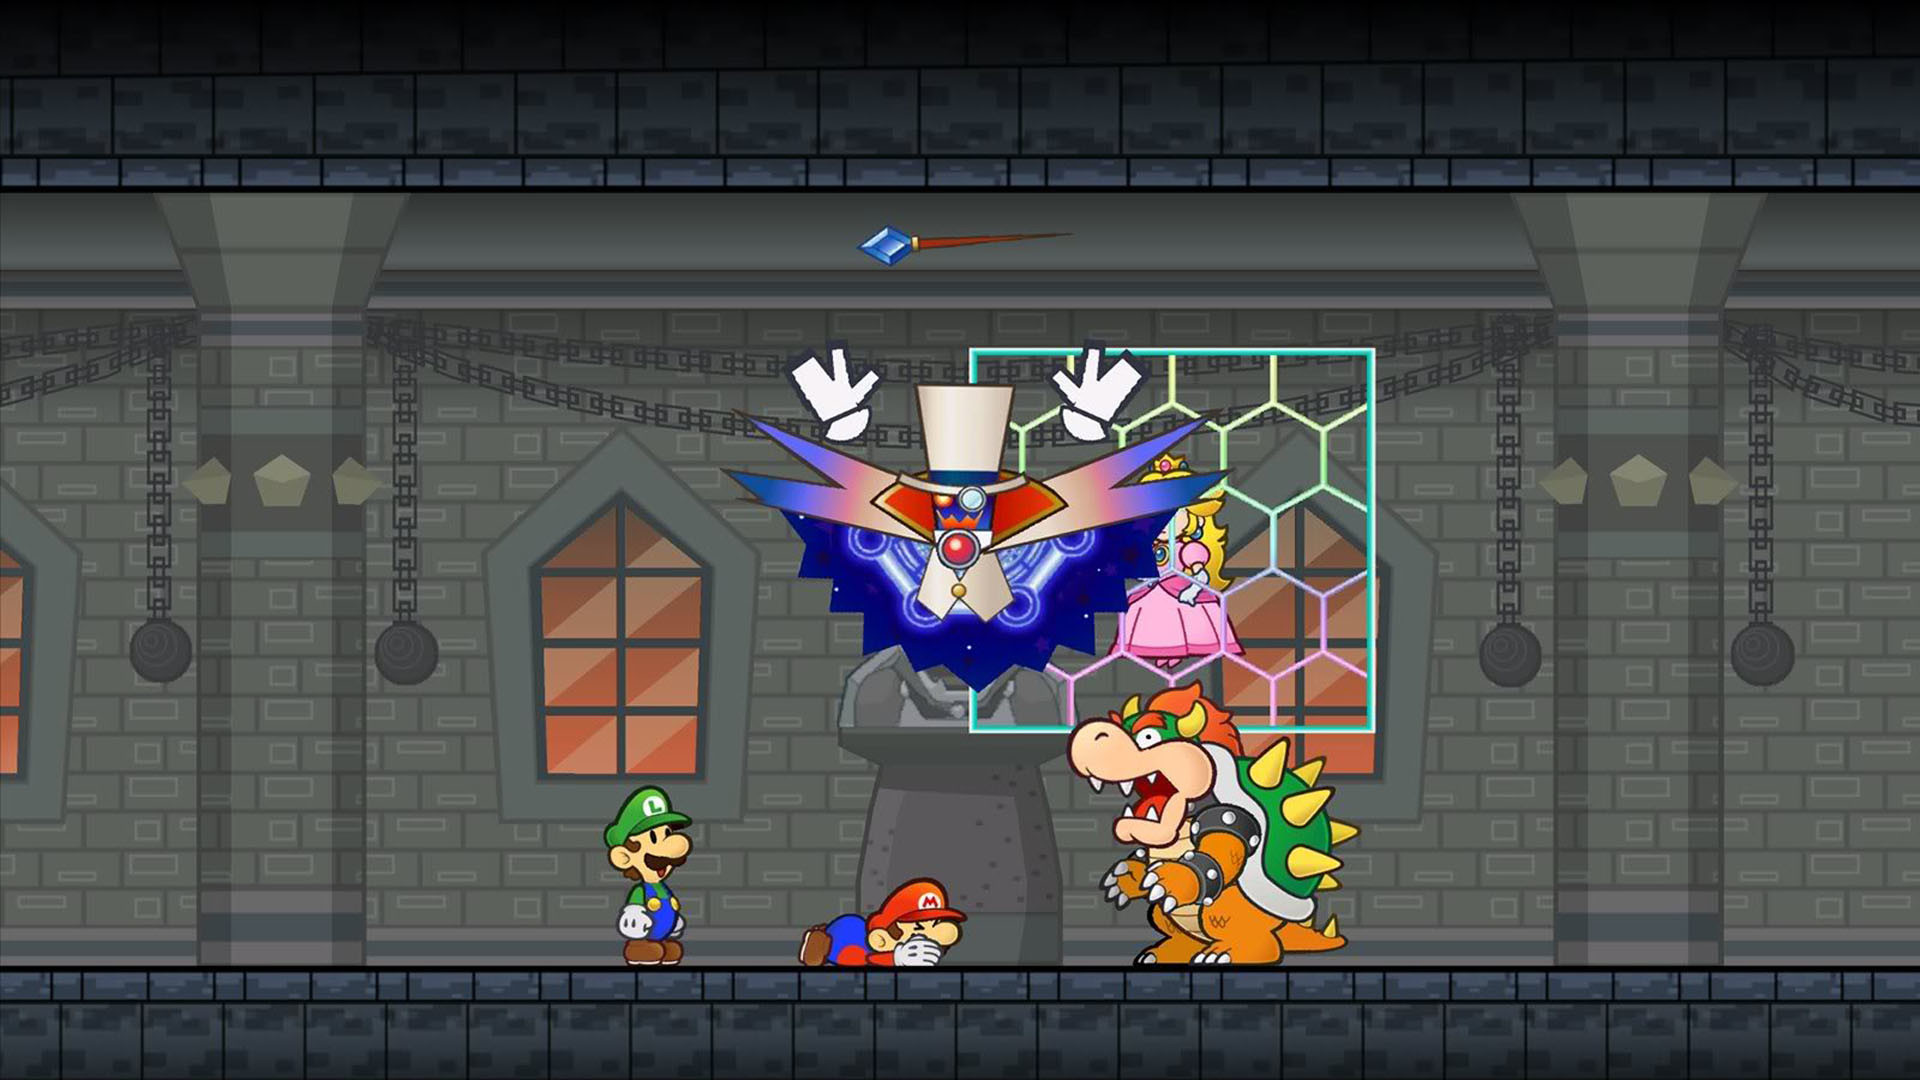 Res: 1920x1080, Super Paper Mario And Bowser